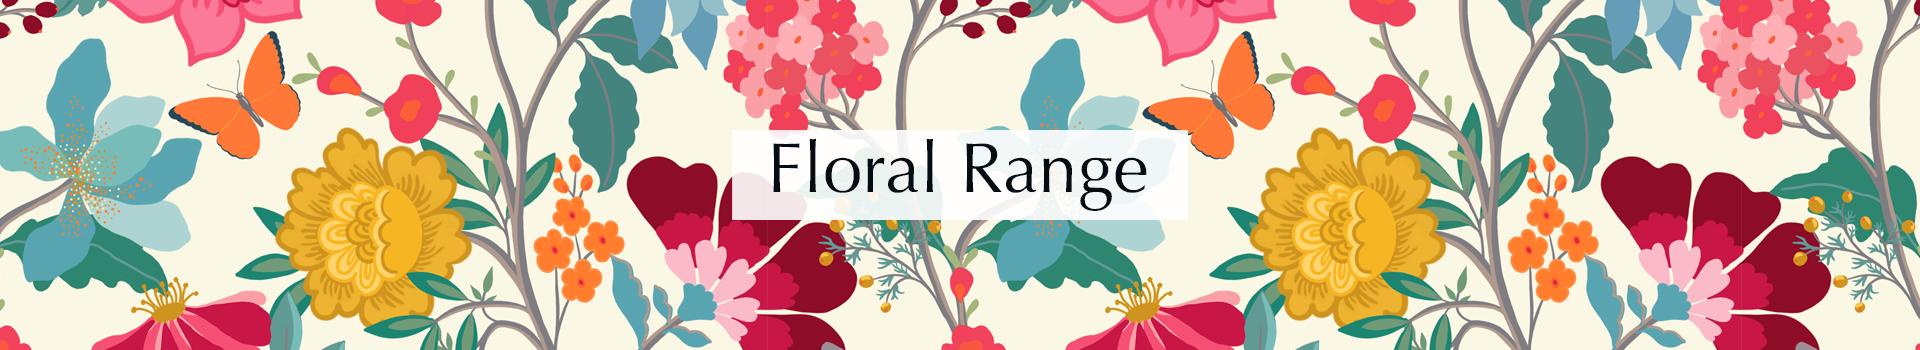 floral-range-category-banner-celina-digby.png